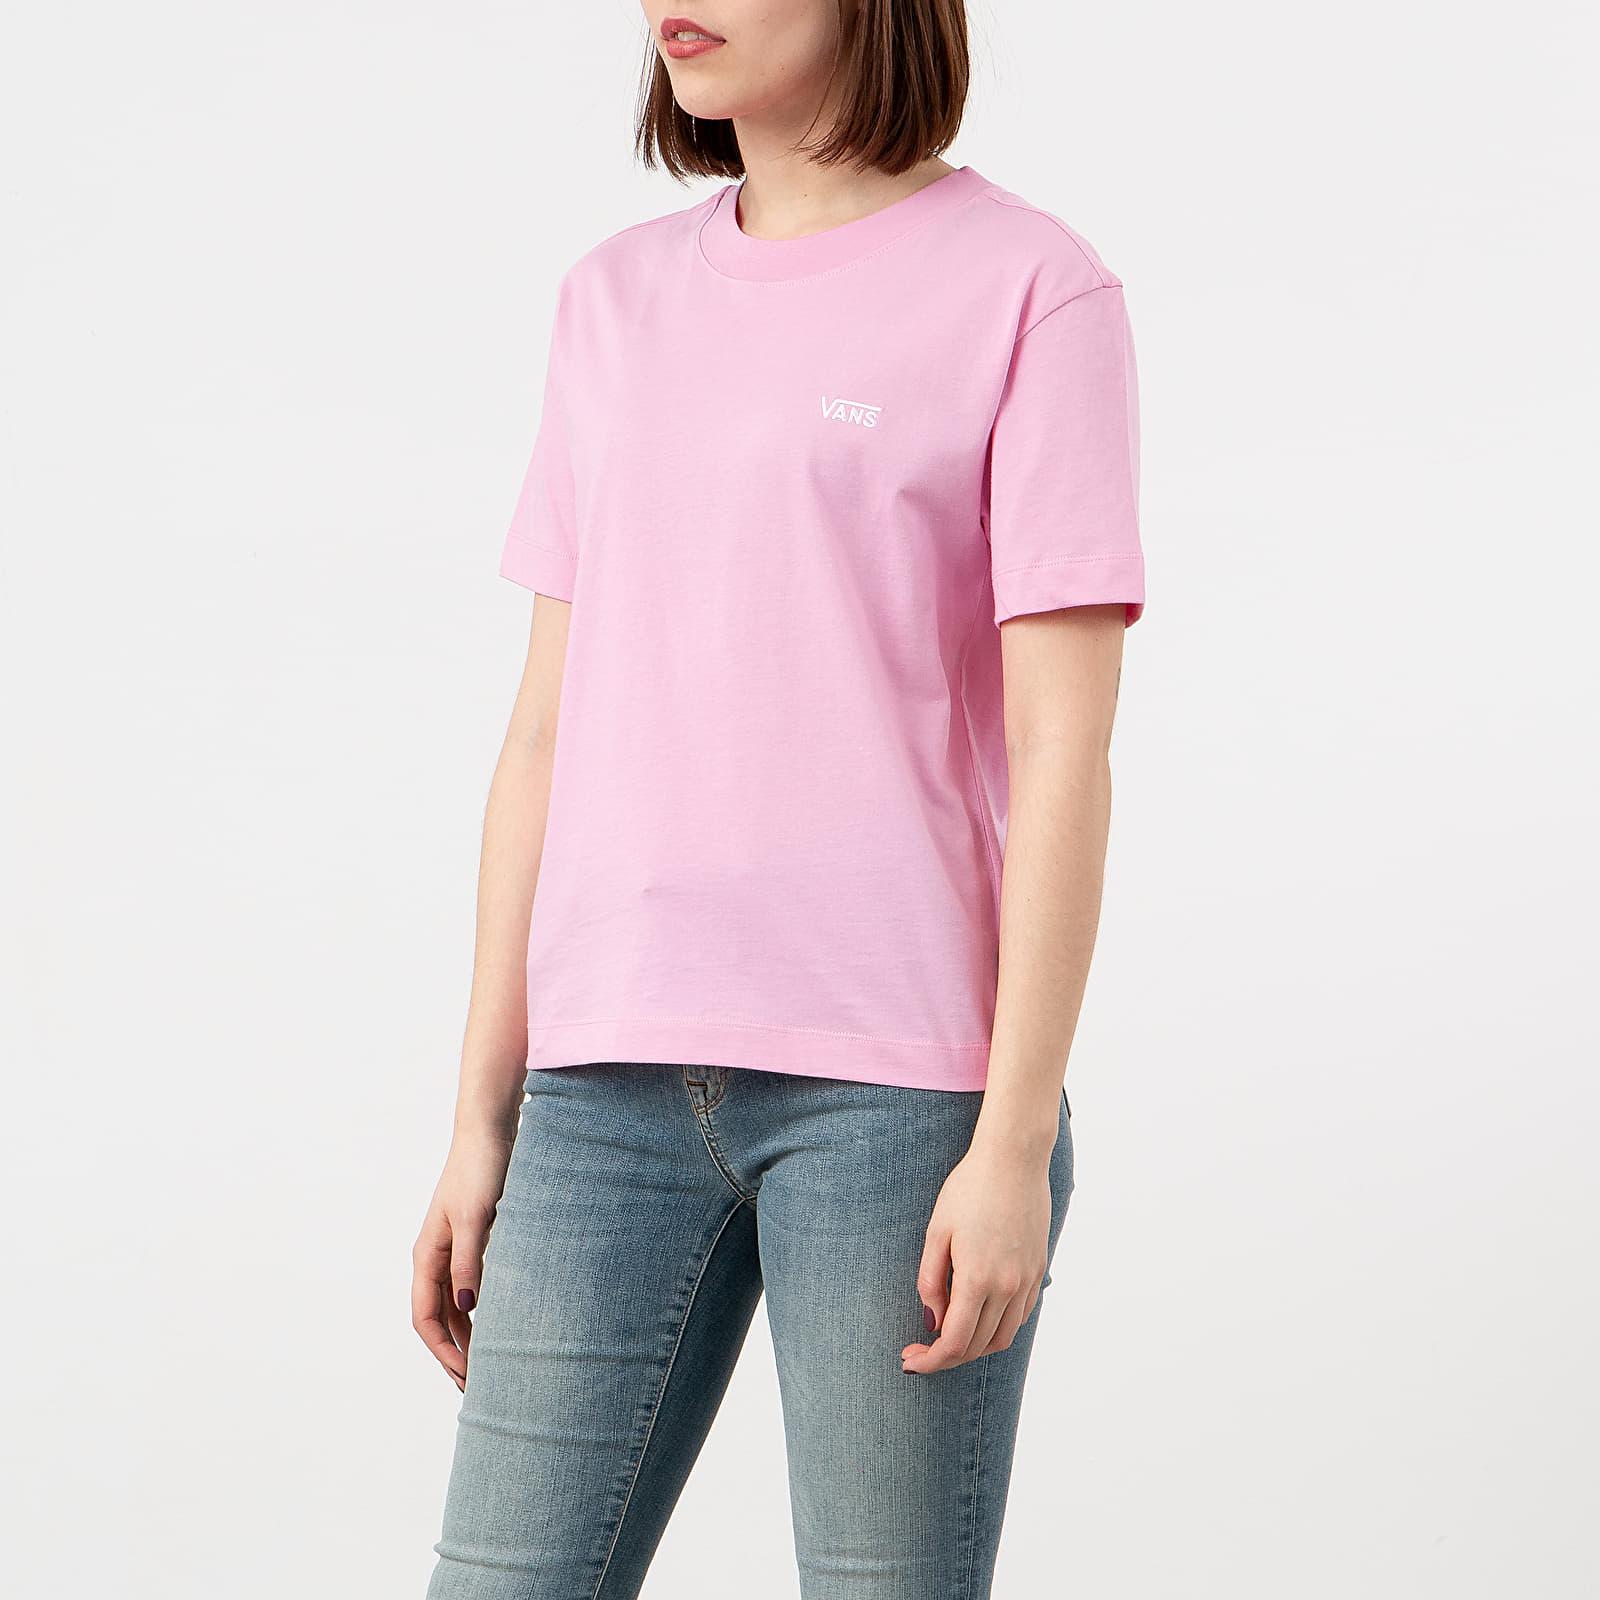 Trička Vans Junior V Boxy Tee Fuchsia Pink